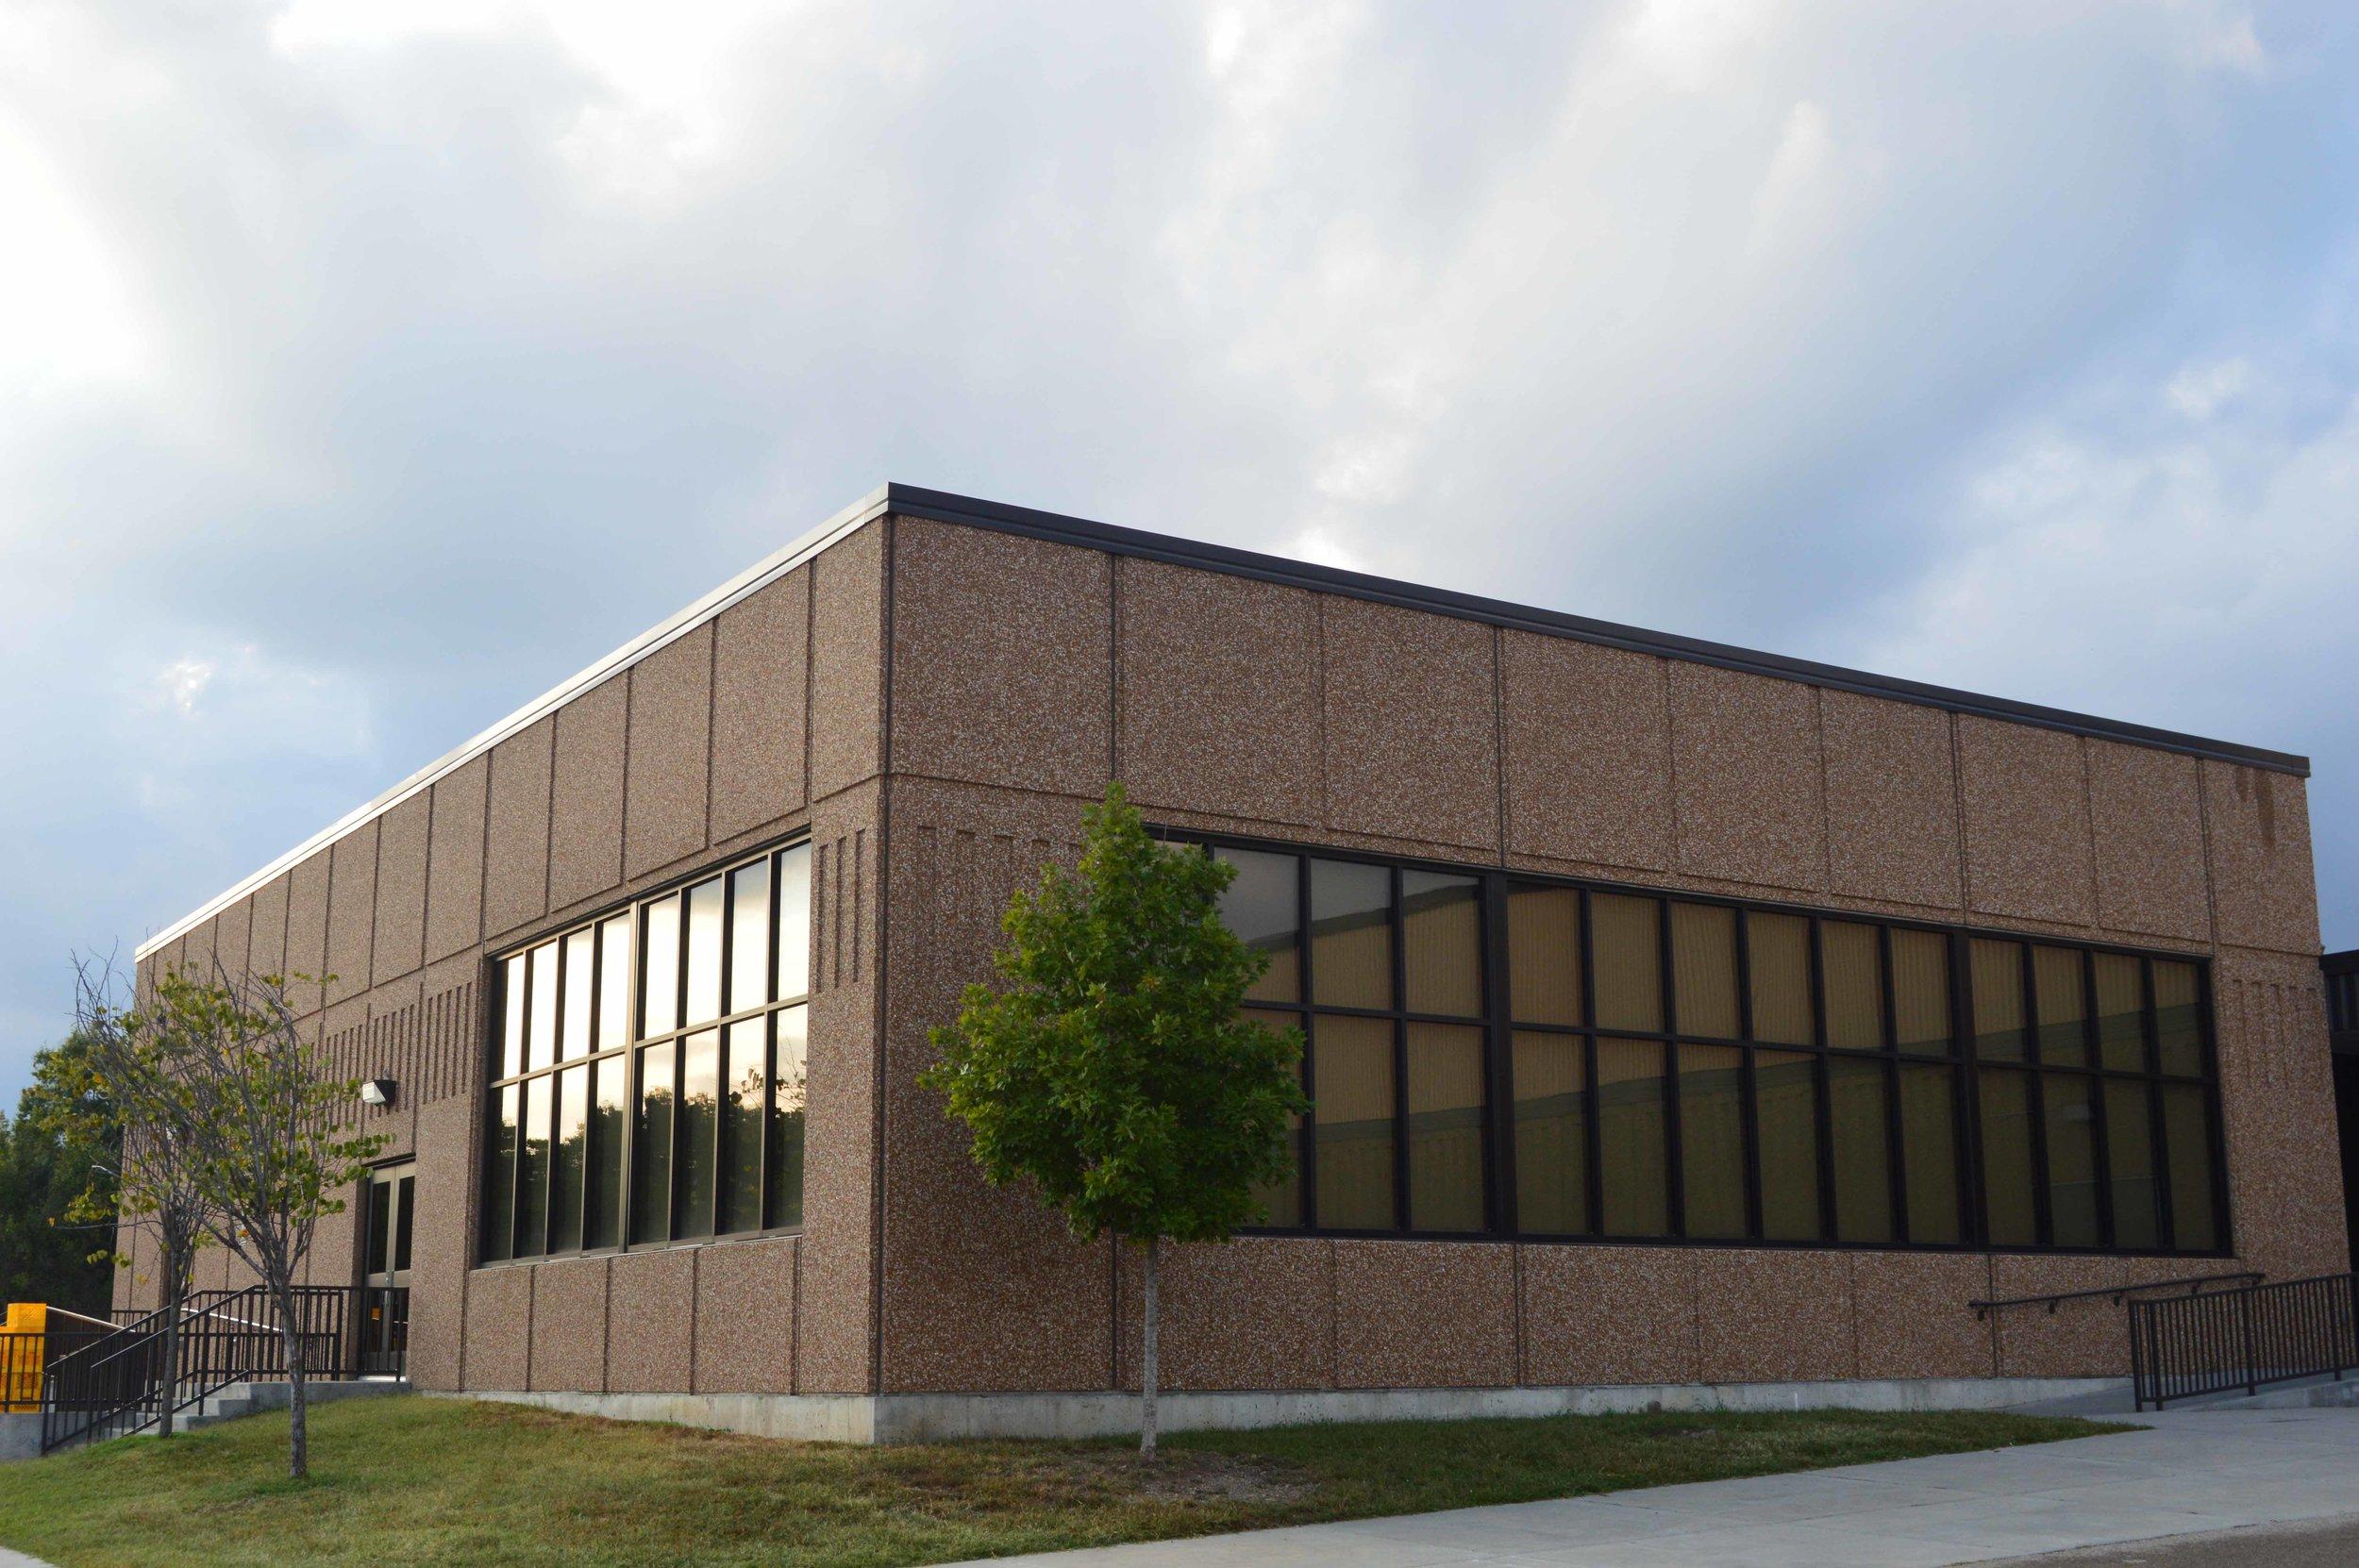 Shawnee Heights Elementary Renovation   Client: USD 450 Shawnee Heights Architect: HTK Architects